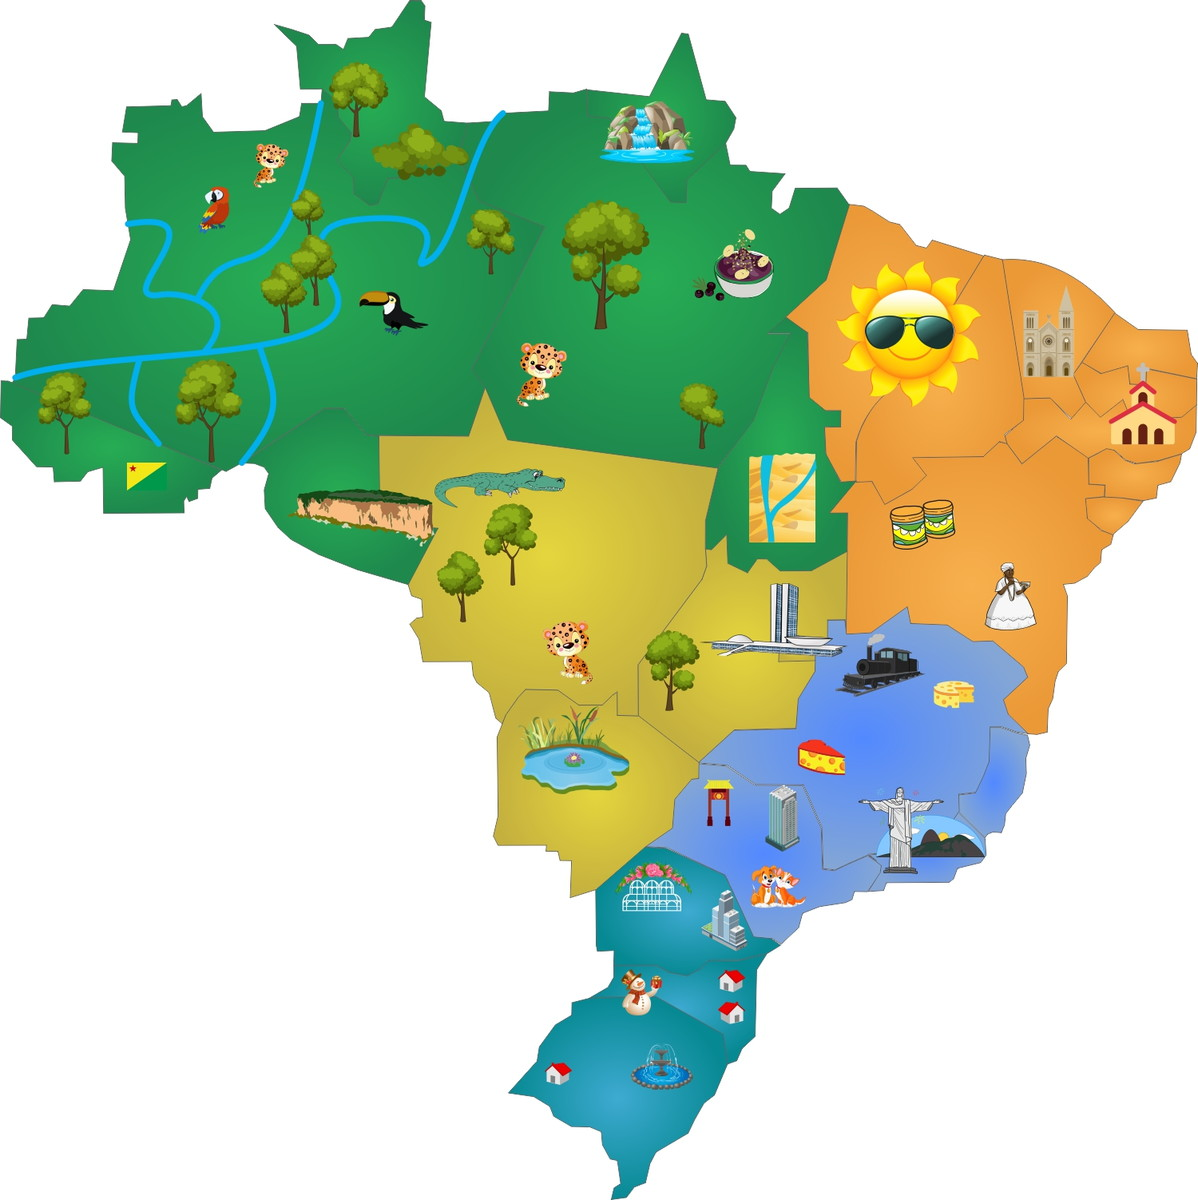 mapa brasil Adesivo Decorativo Mapa do Brasil no Elo7 | Costa Barros Decor  mapa brasil